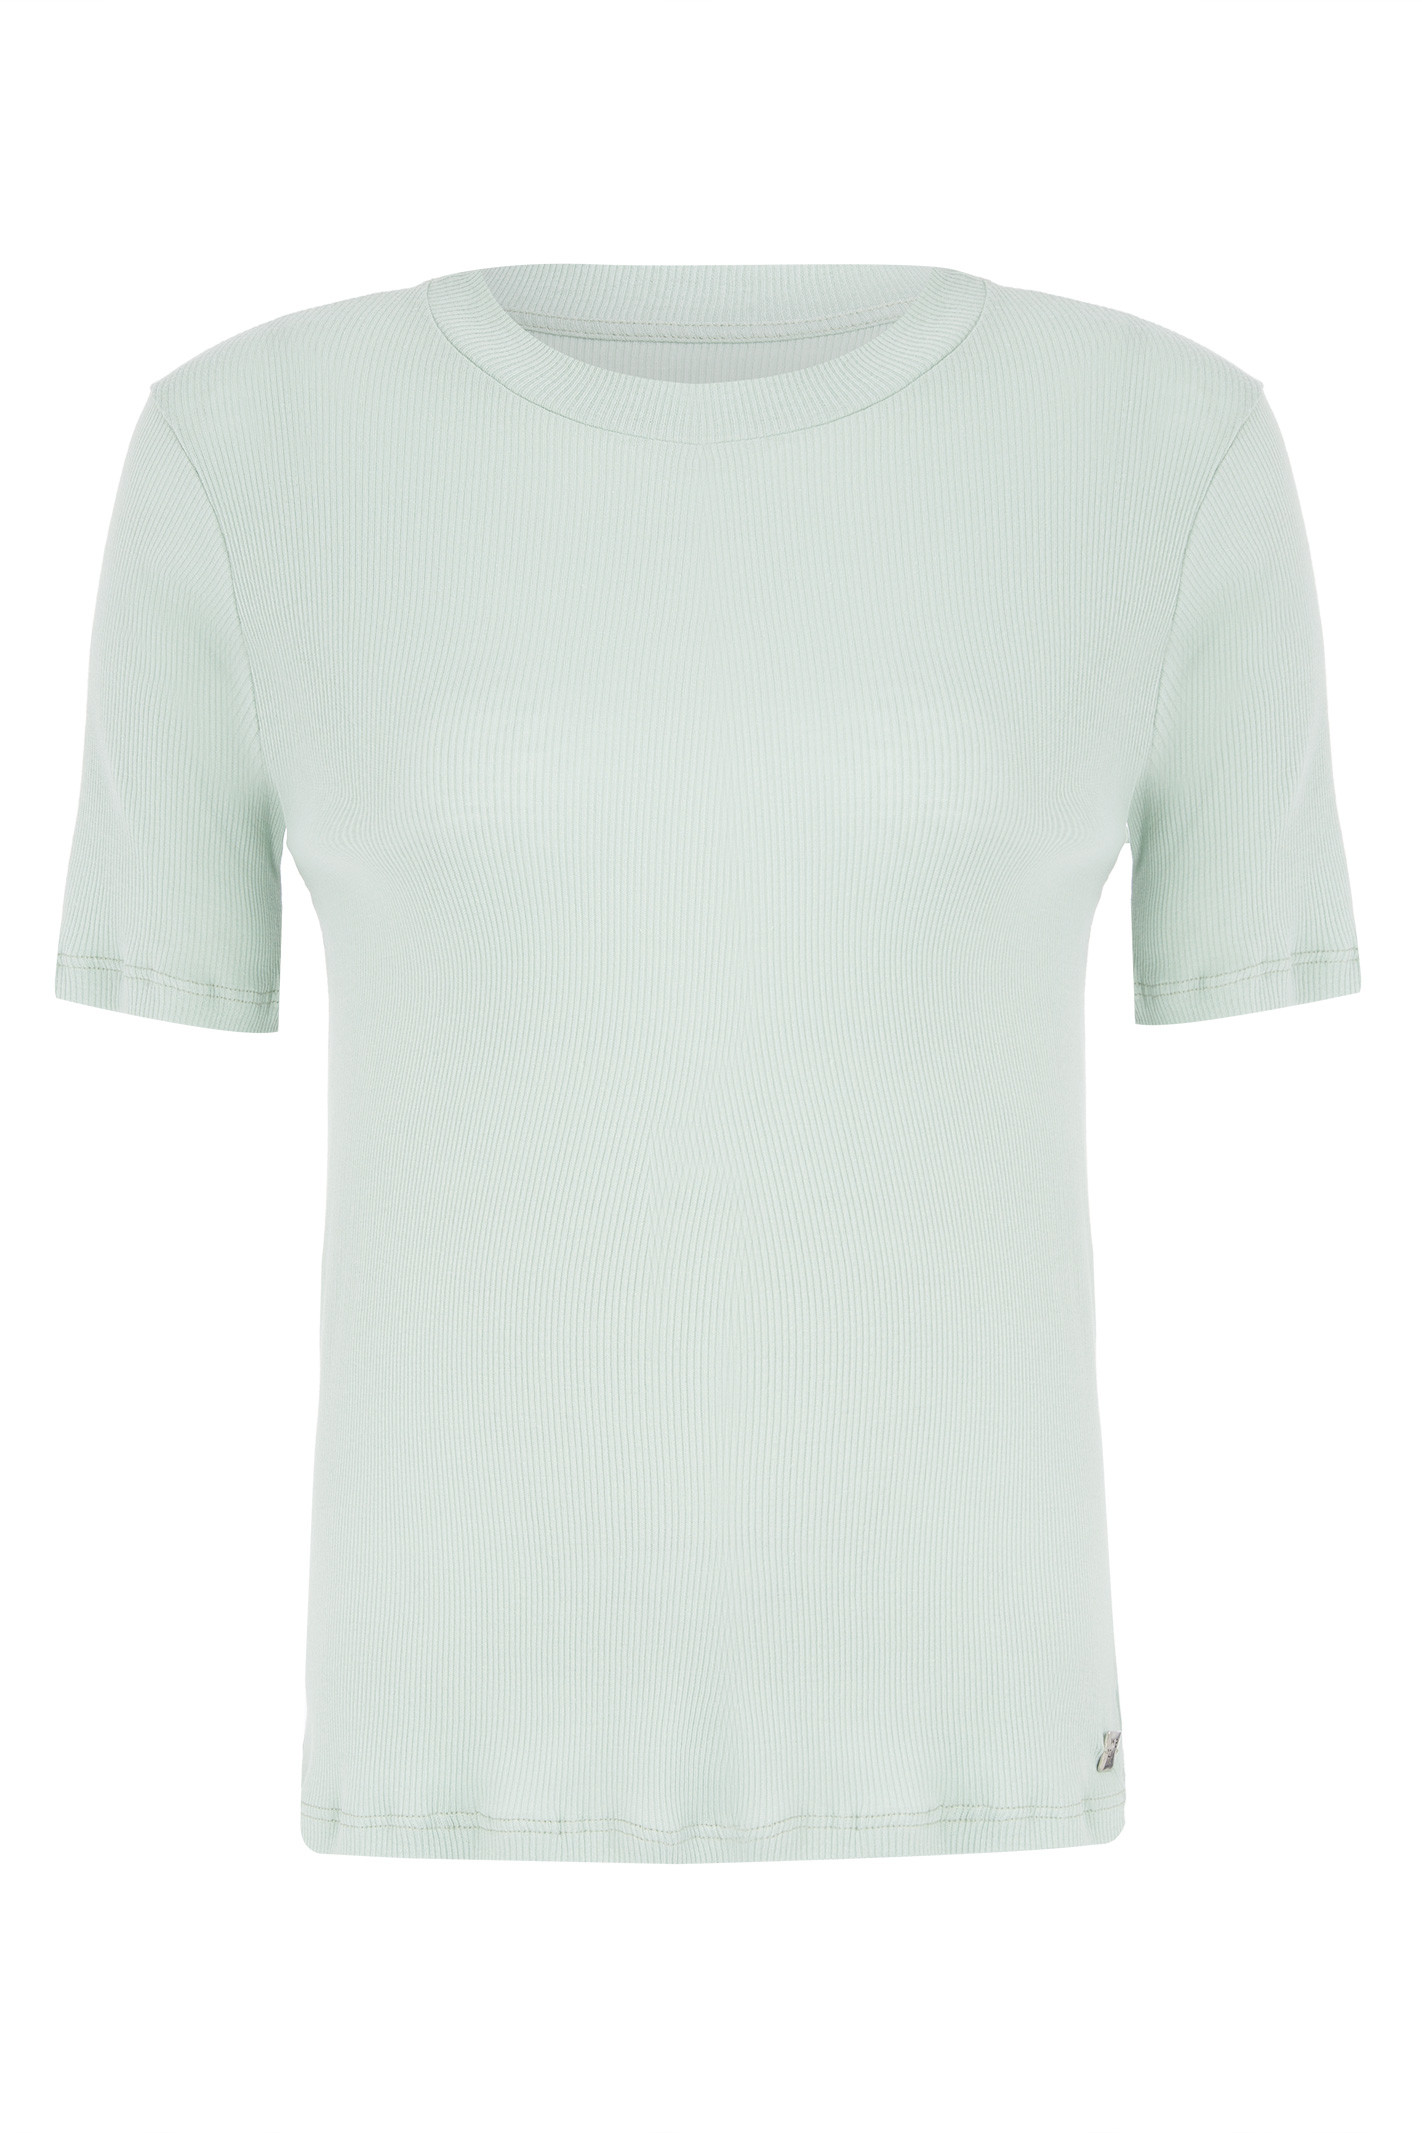 Tshirt Canelado - Verde